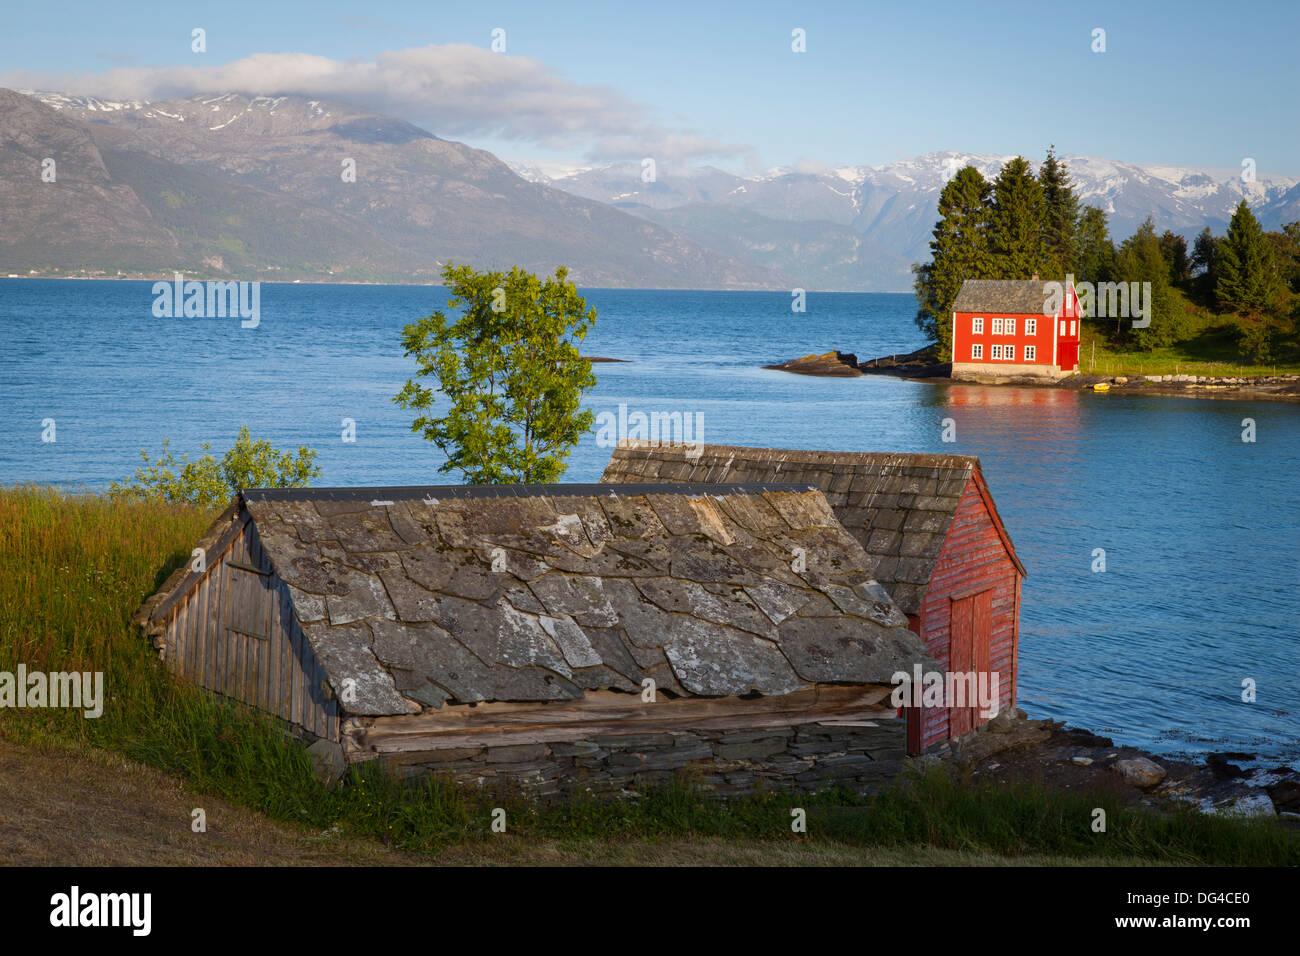 Idyllische ländliche Insel im Hardanger Fjord, Hordaland, Norwegen, Skandinavien, Europa Stockbild